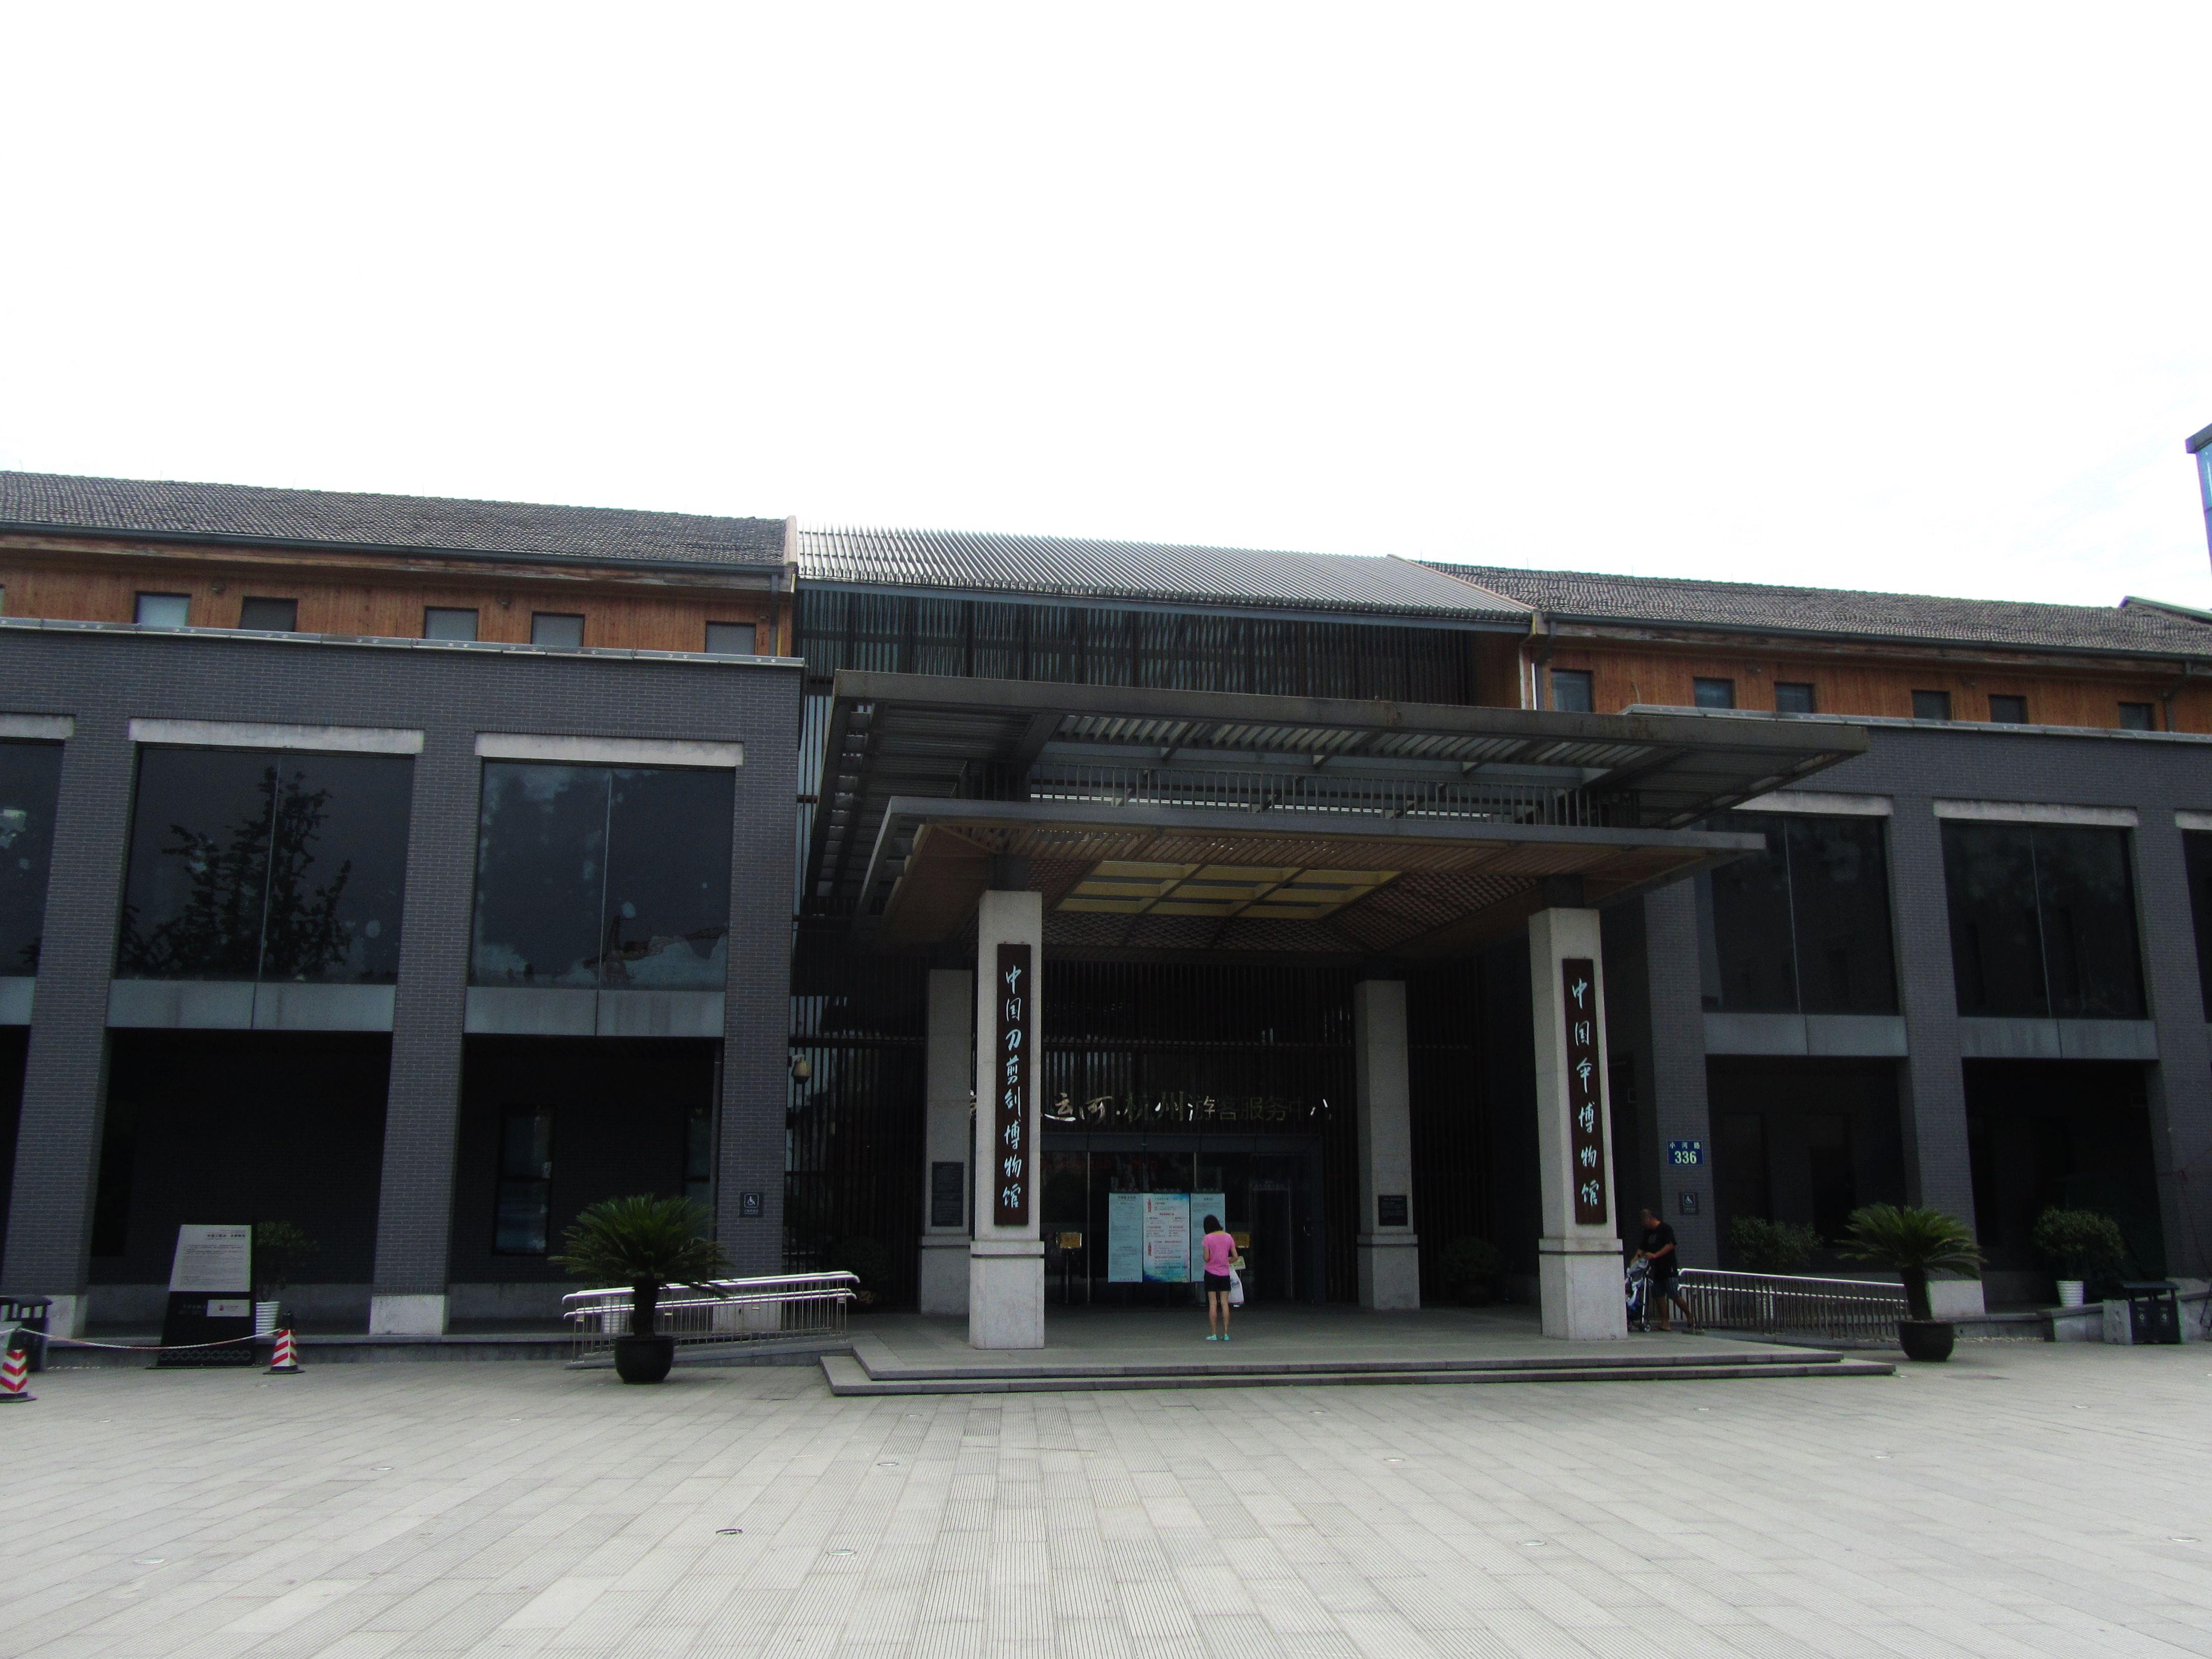 File Hangzhou Arts And Crafts Museum 02 2013 07 Jpg Wikimedia Commons